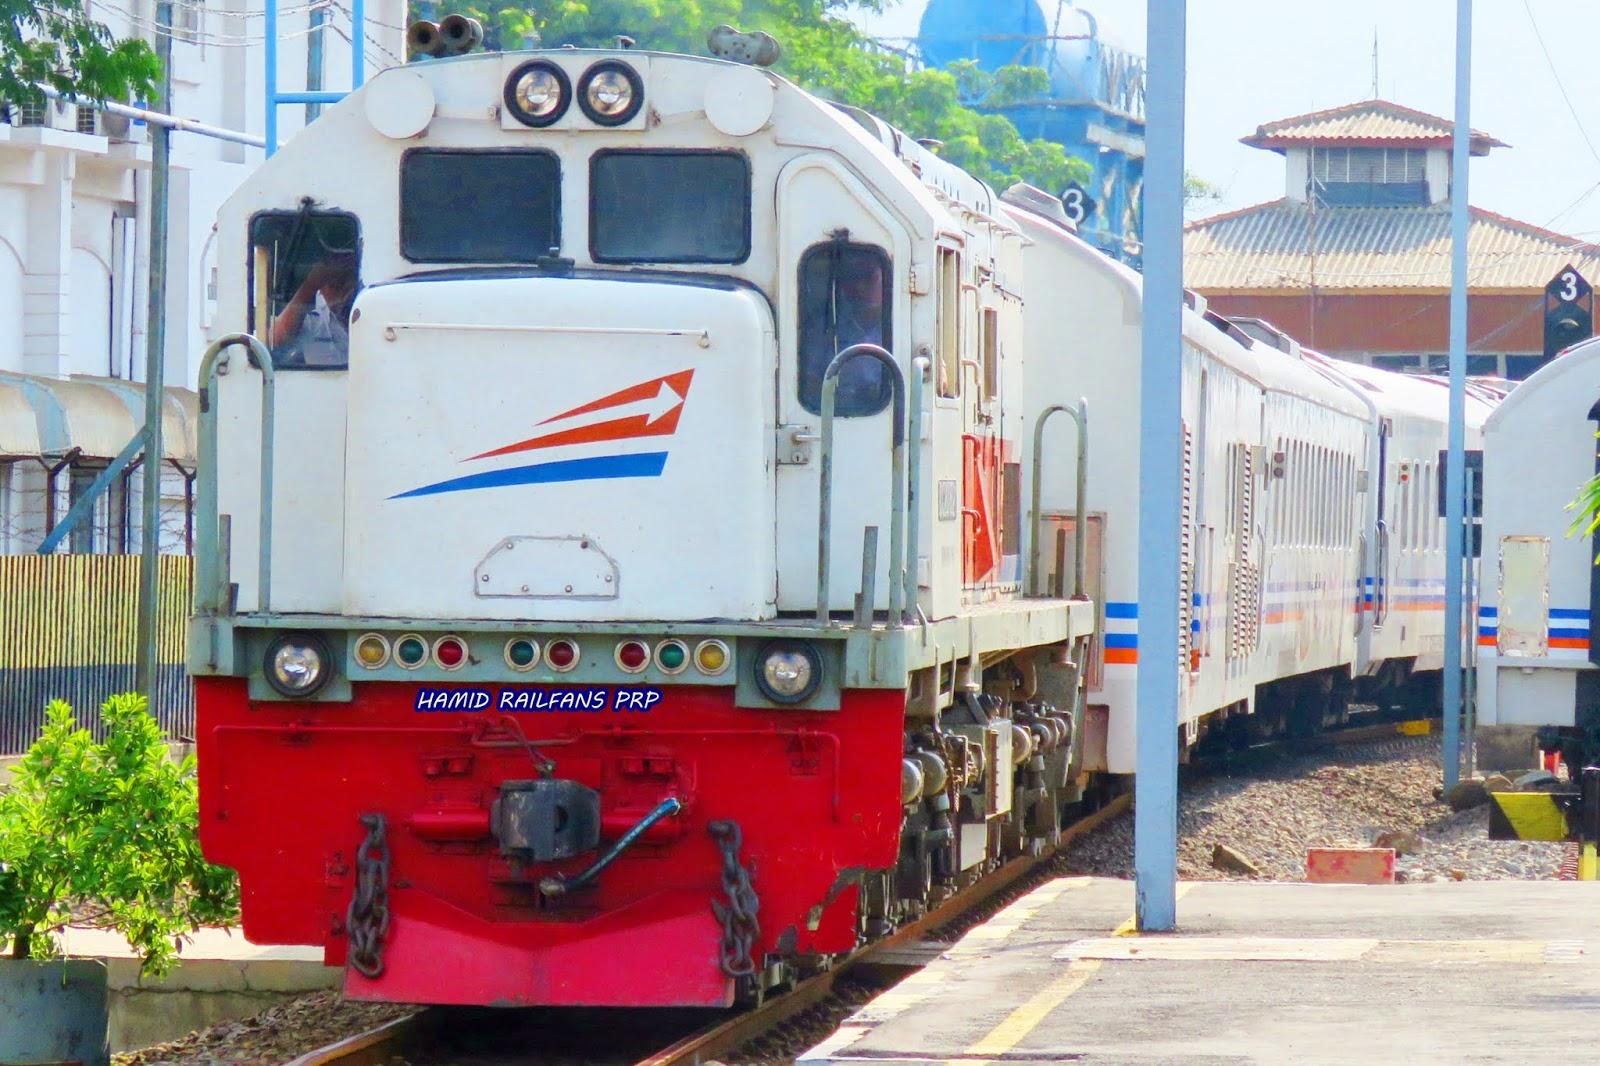 Jadwal Kereta Api Joglosemarkerto 2019 Hamid Railfans Prp